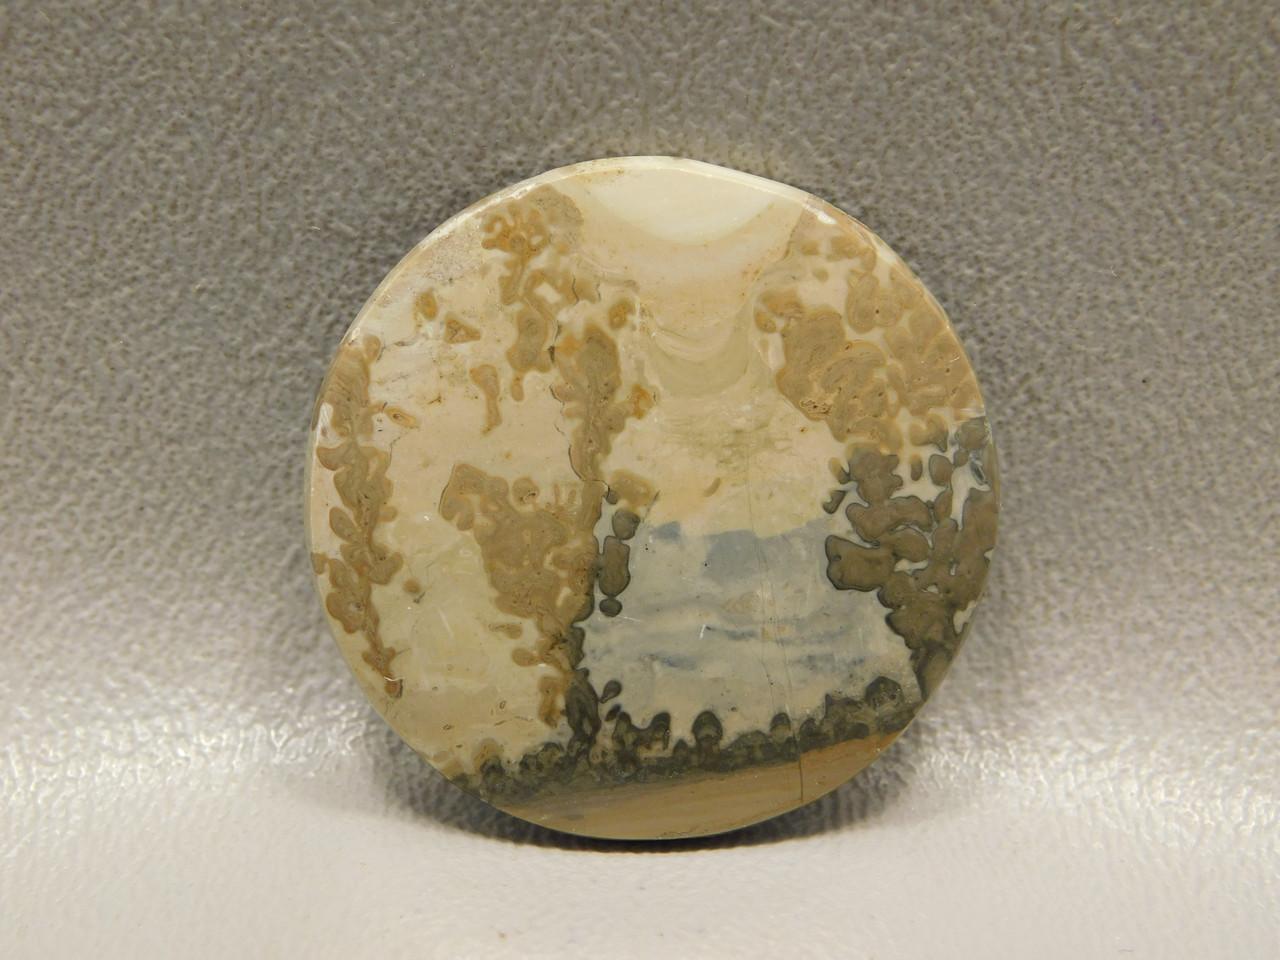 Cotham Marble Fossil Stone Cabochon 33 mm Round Gemstone #5